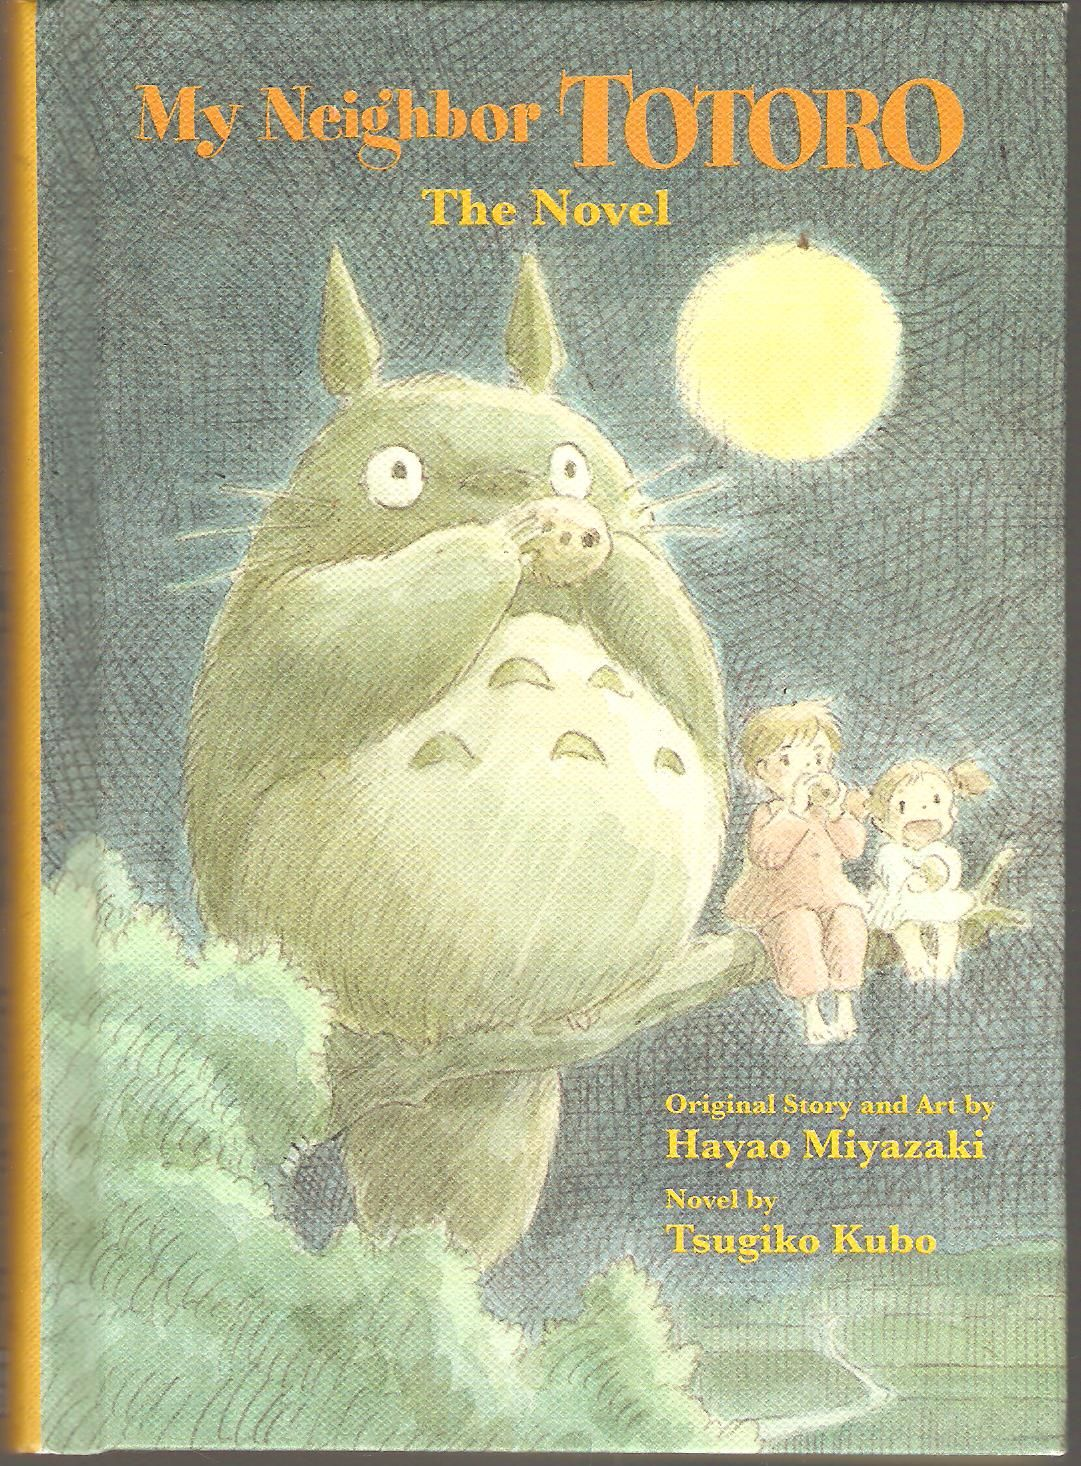 My neighbor totoro the novel original story and art by